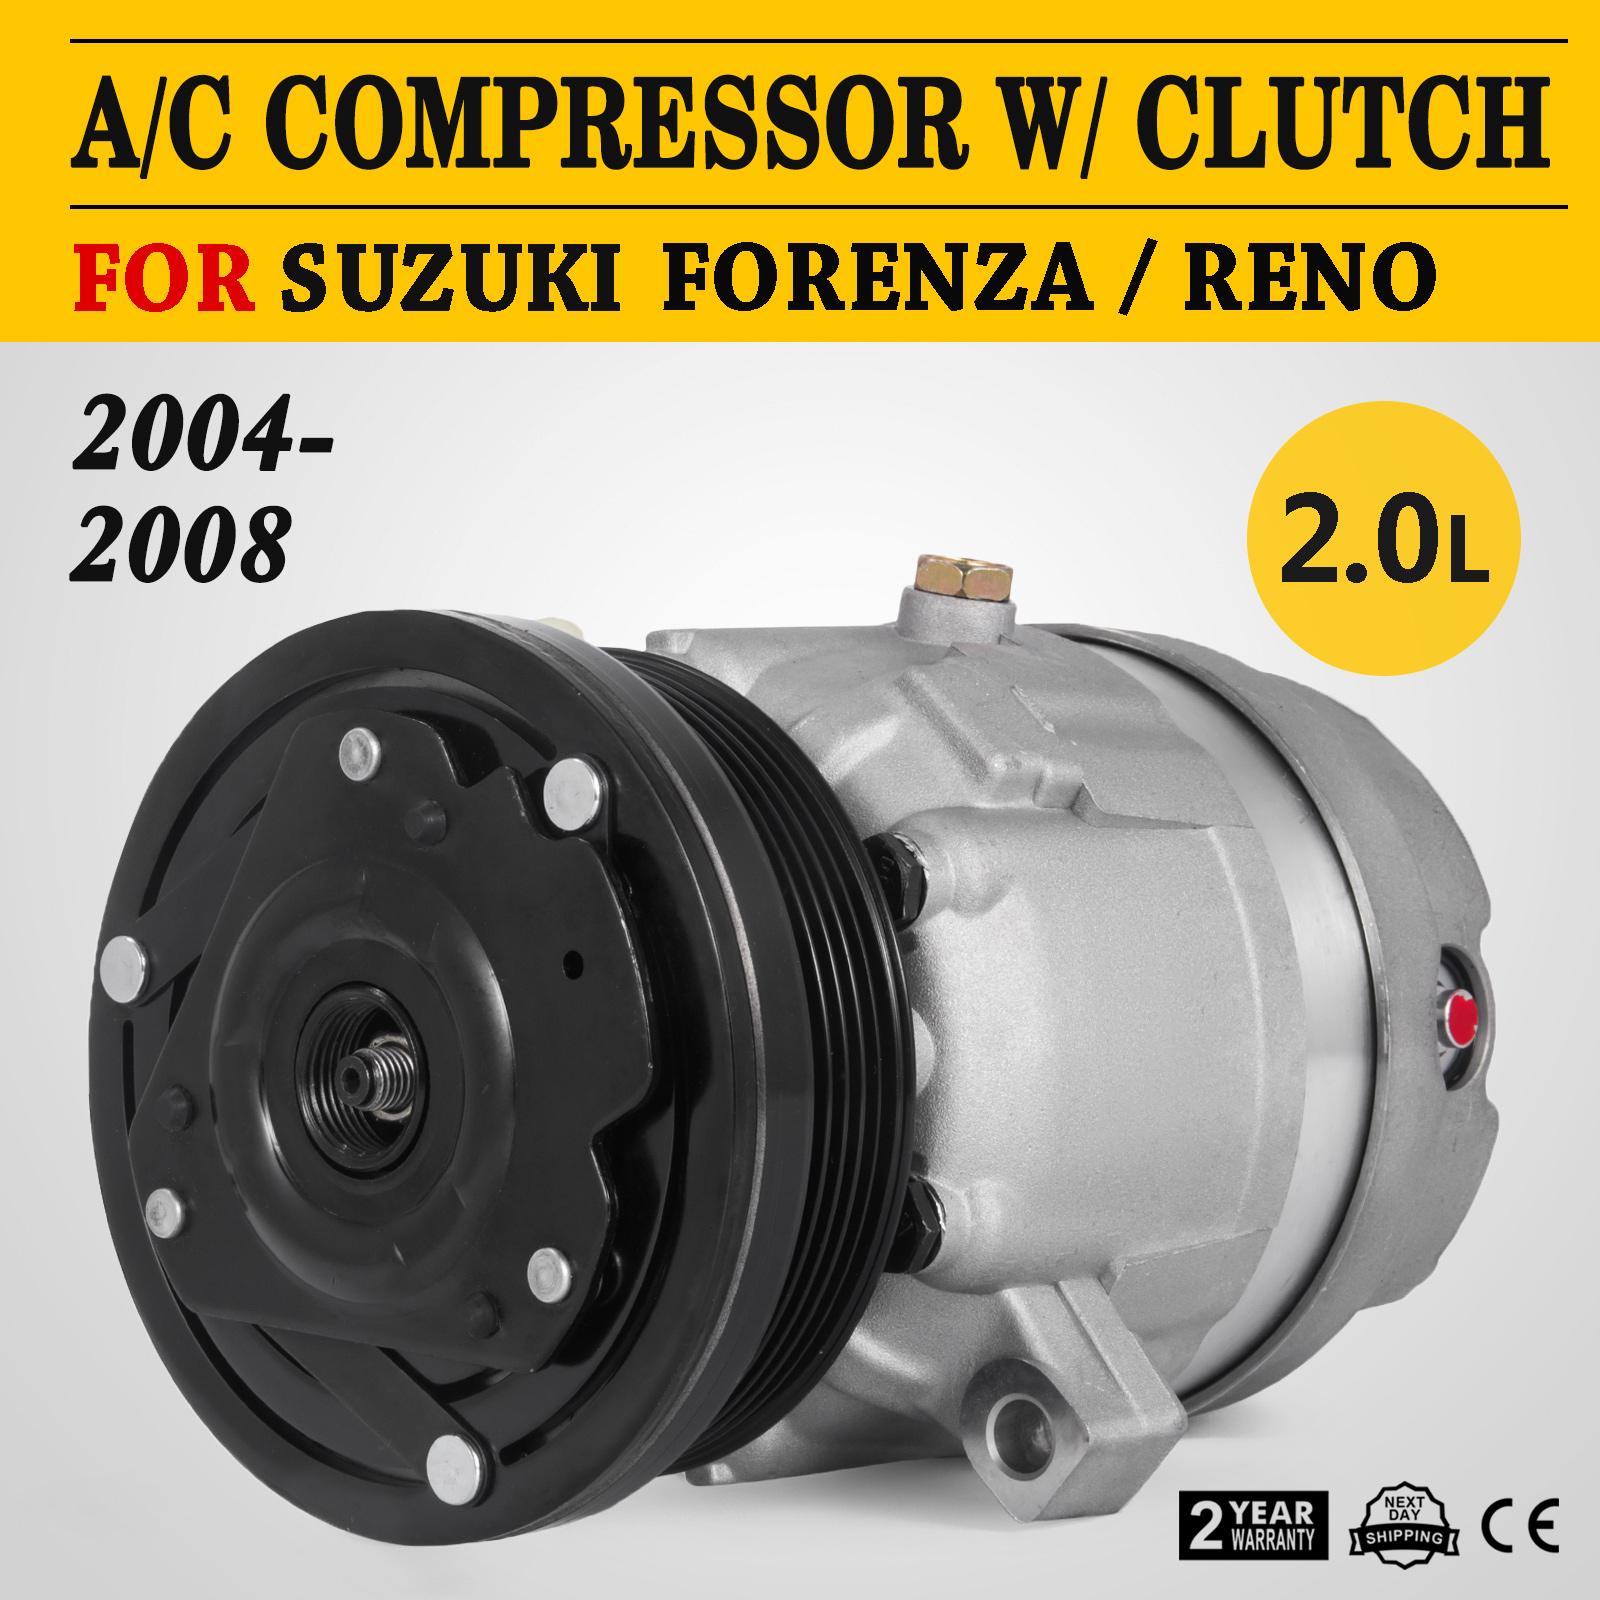 REMAN 1YW AC COMPRESSOR 97272 FOR 2004-2008 SUZUKI FORENZA 2005-2008 RENO